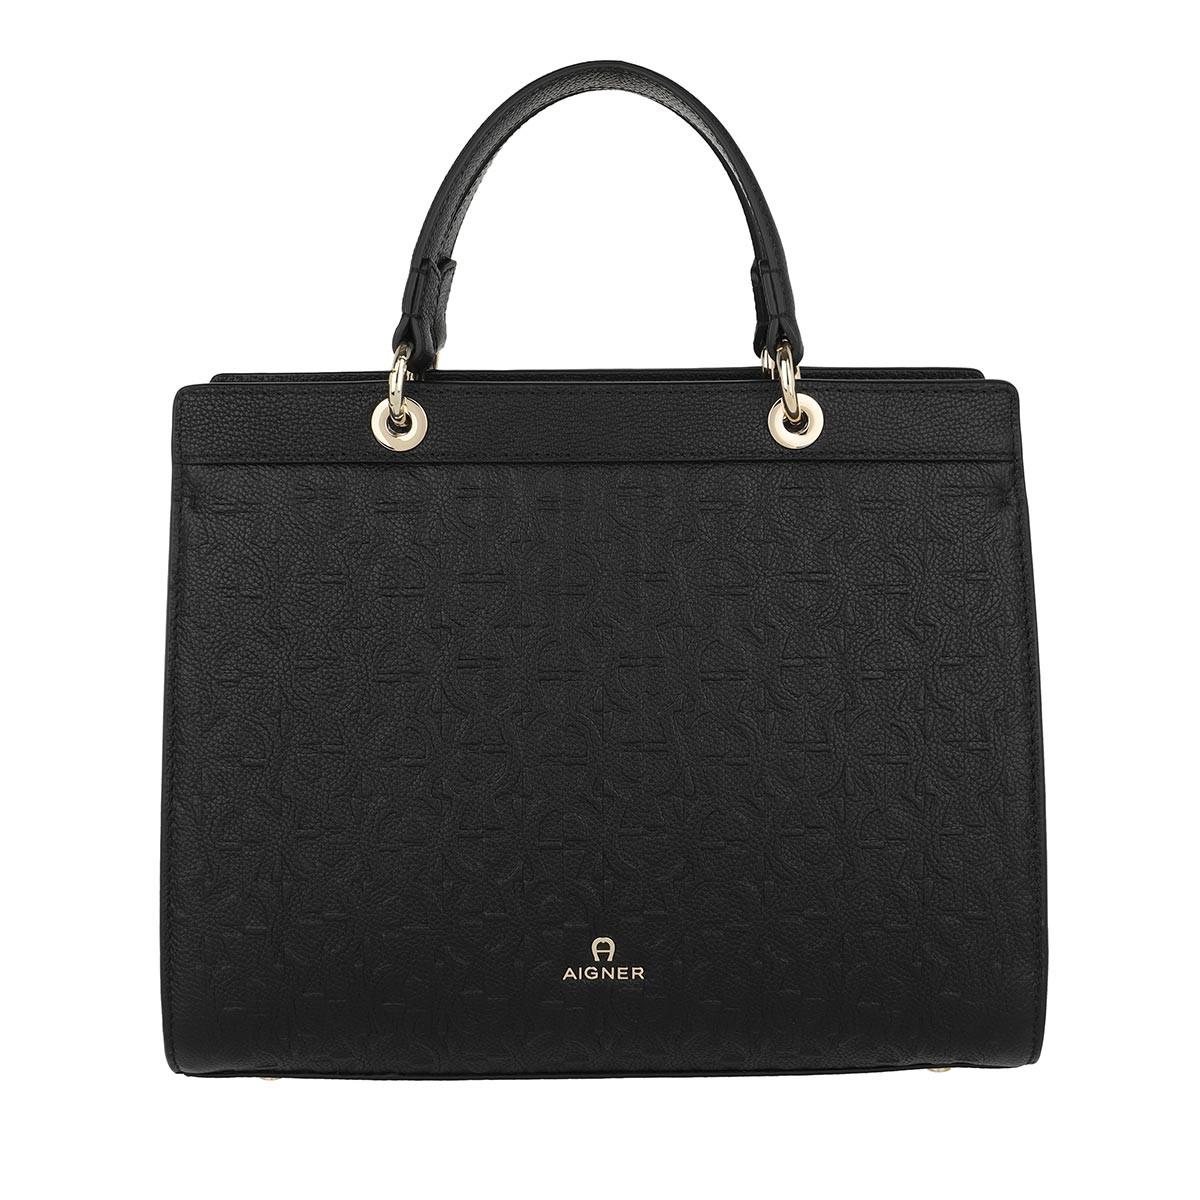 Aigner Tote - Handle Bag Carol Black - in schwarz - für Damen